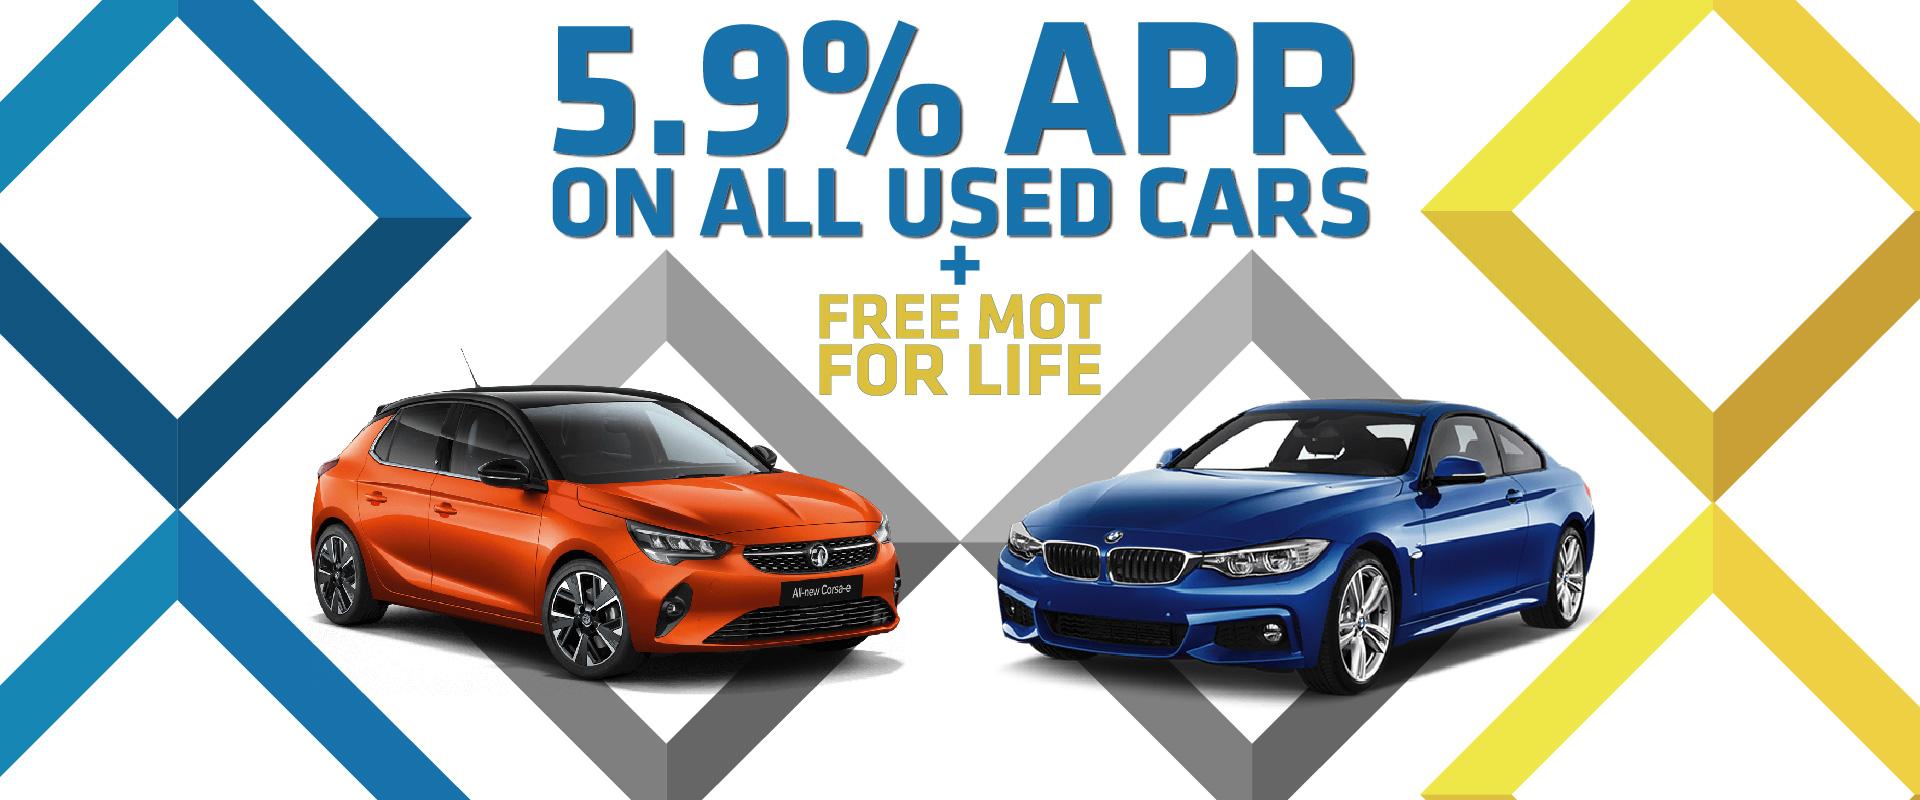 Used Cars Offer. 5.9% APR & Free MOT for Life